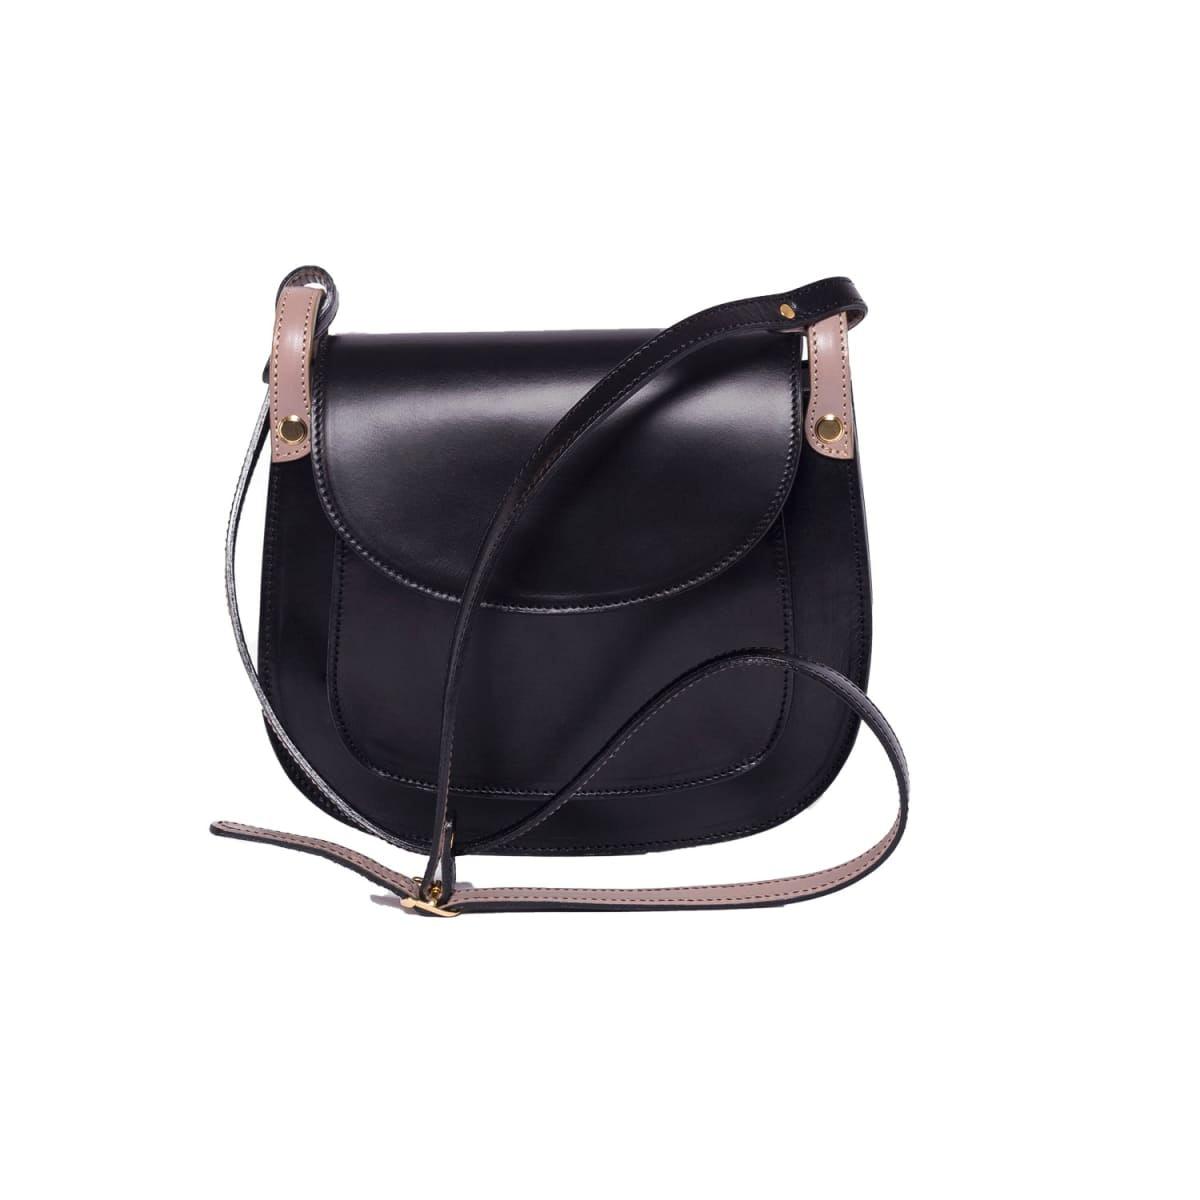 Anglet Black Cross Body Bag